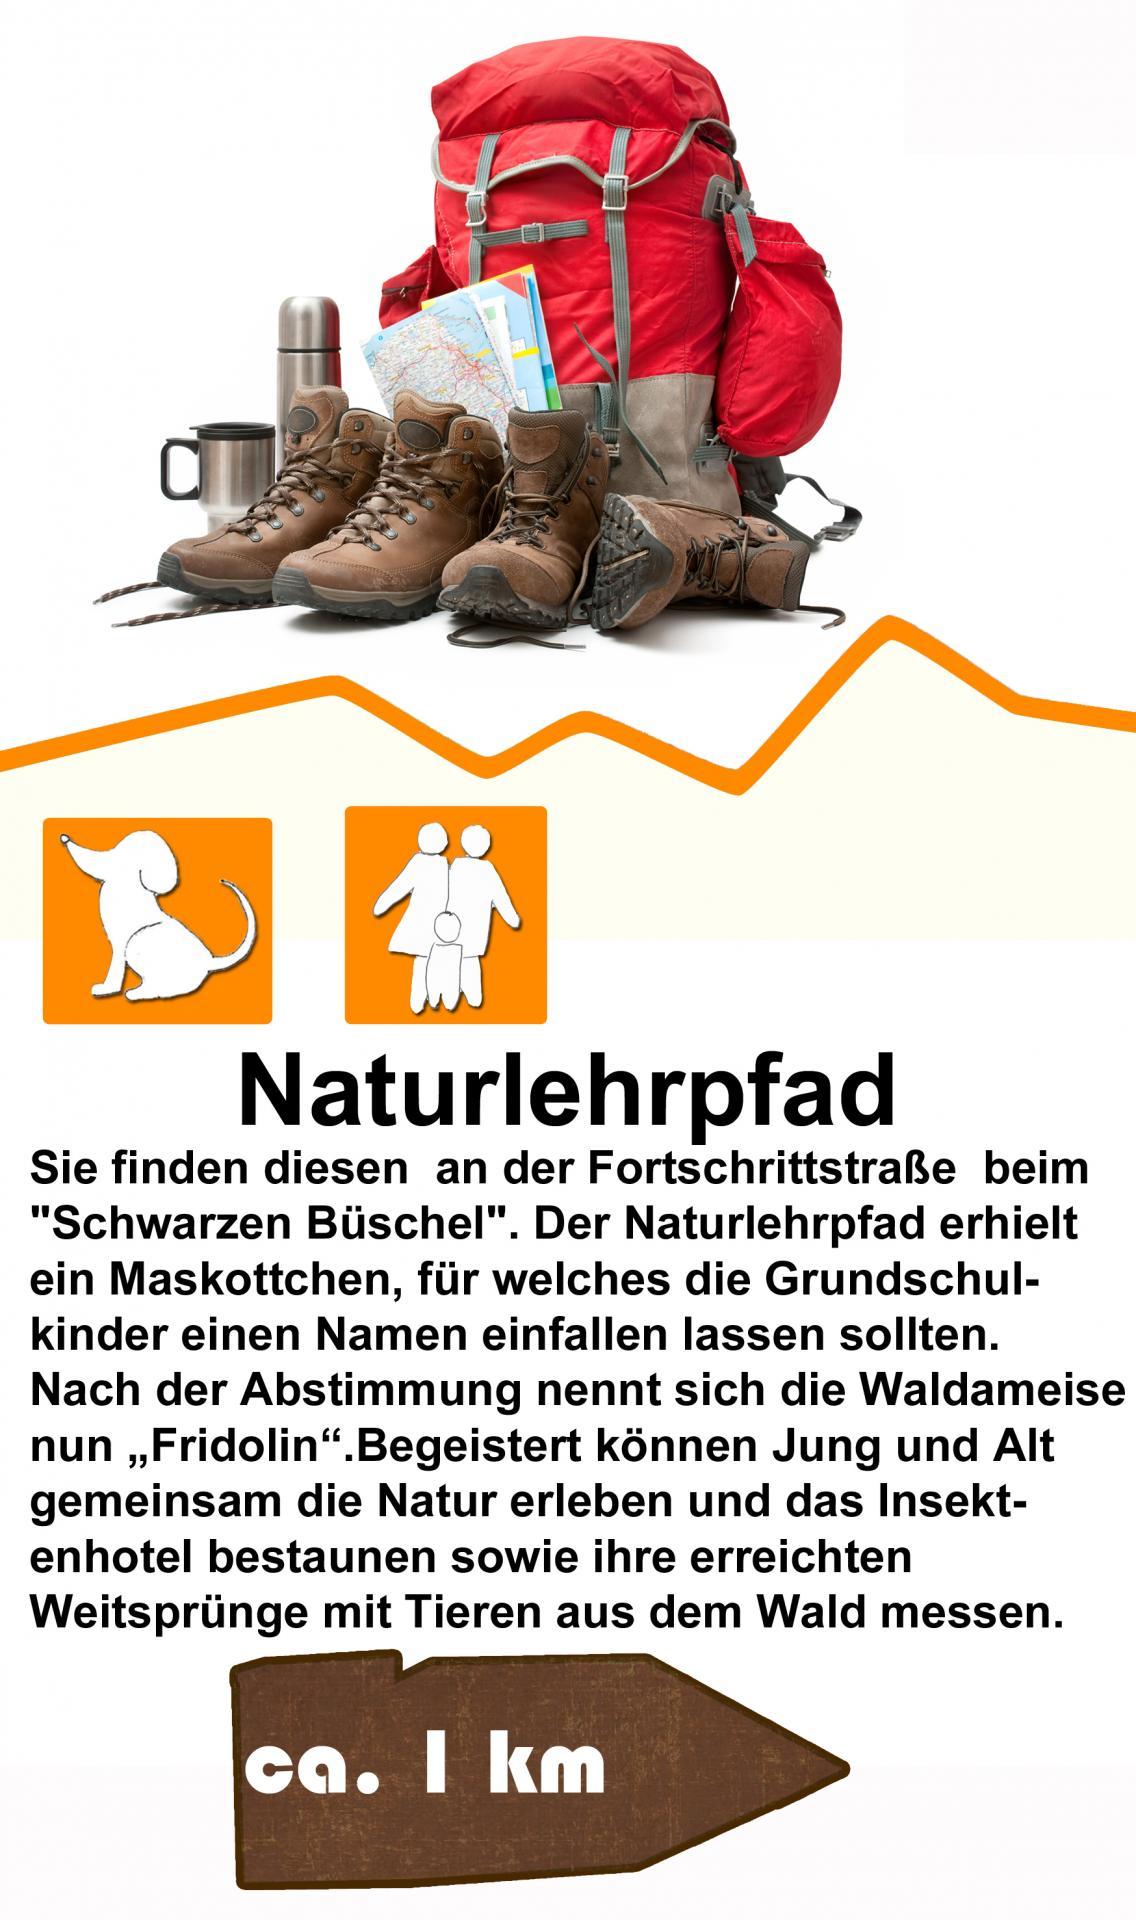 Naturlehrpfad Obergurig